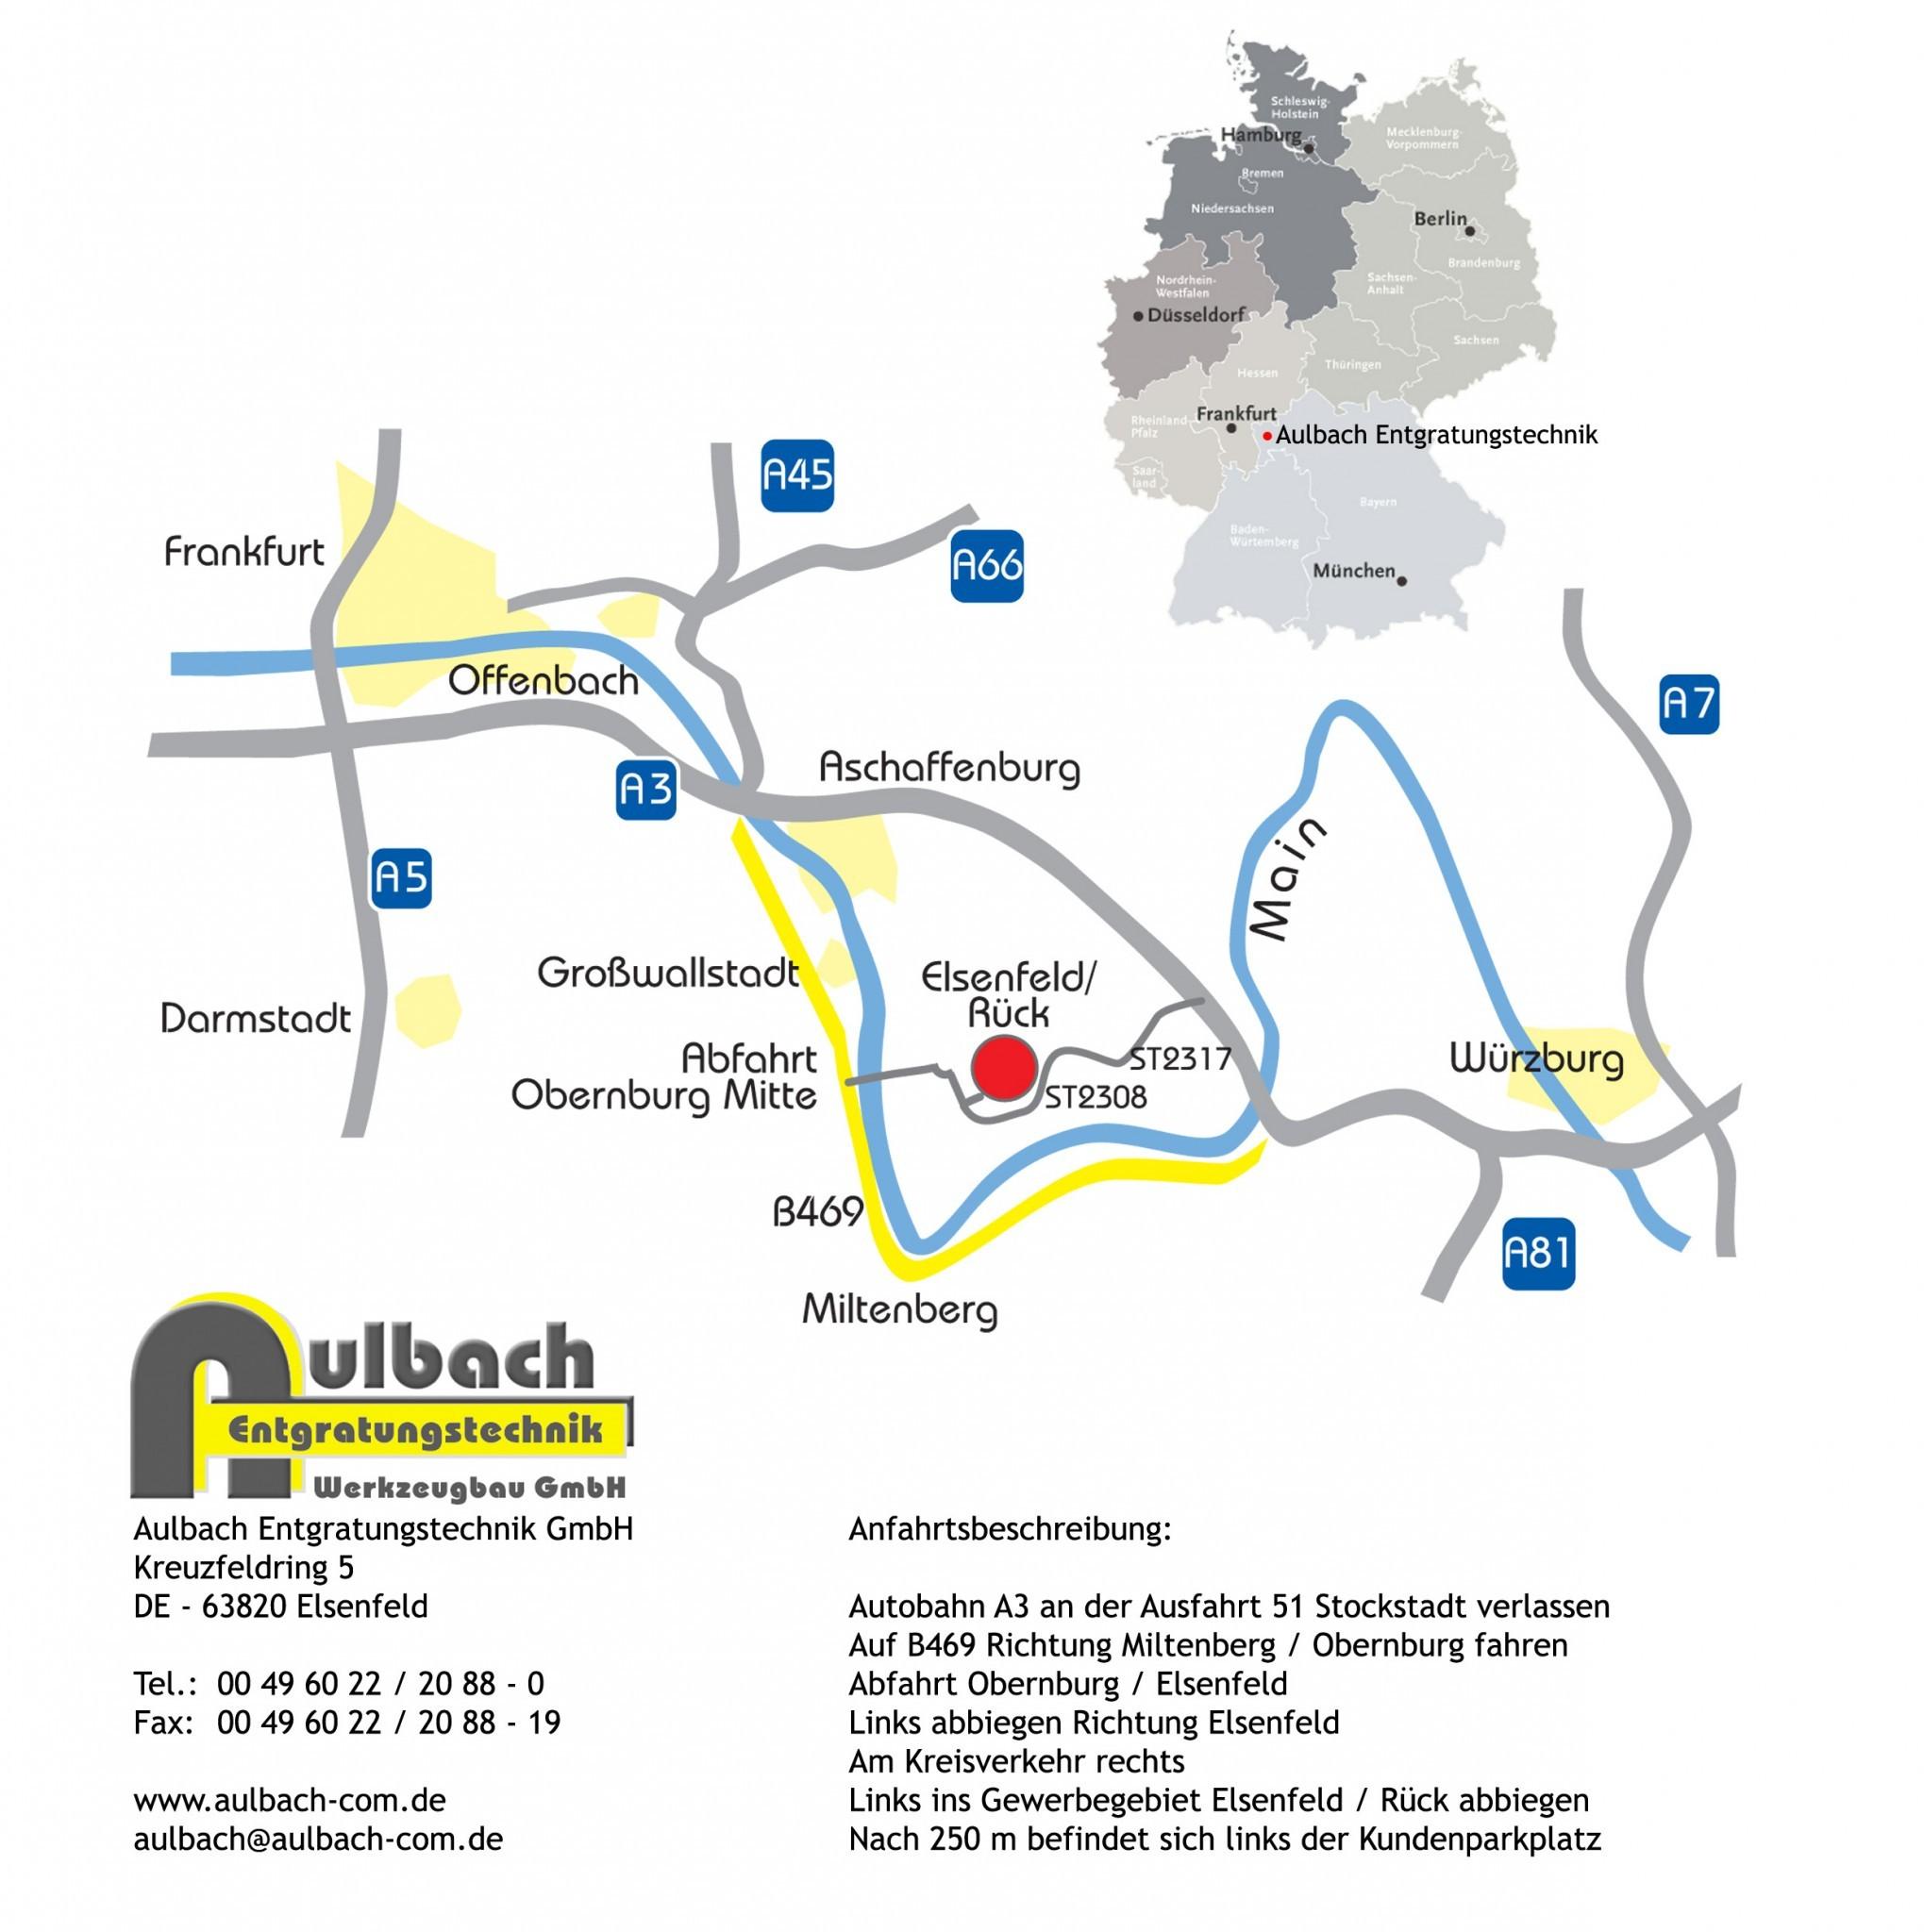 Anfahrt Aulbach Entgratungstechnik1.jpg